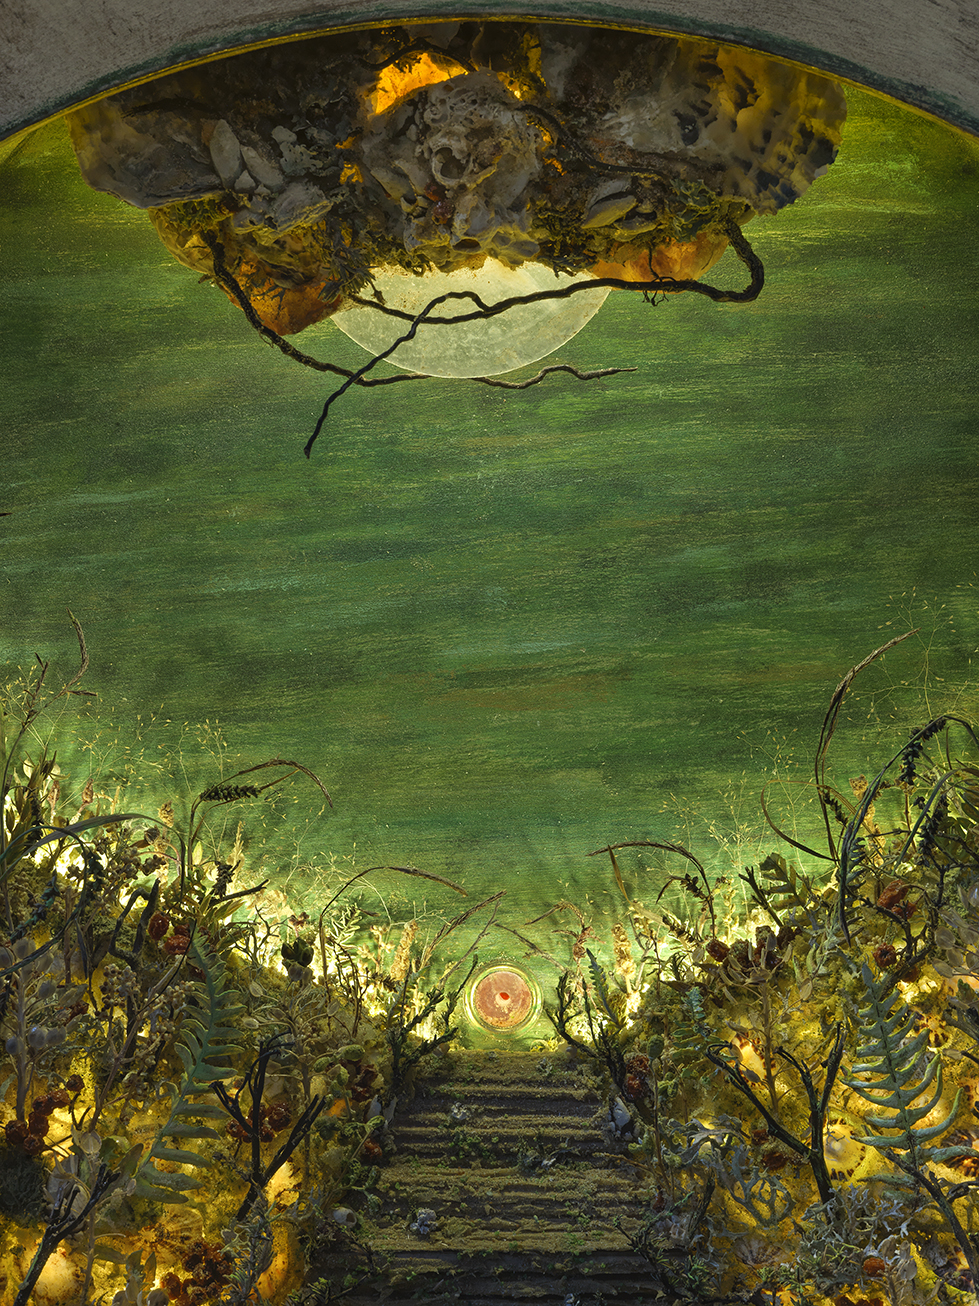 5.oraculo-lunardetalle